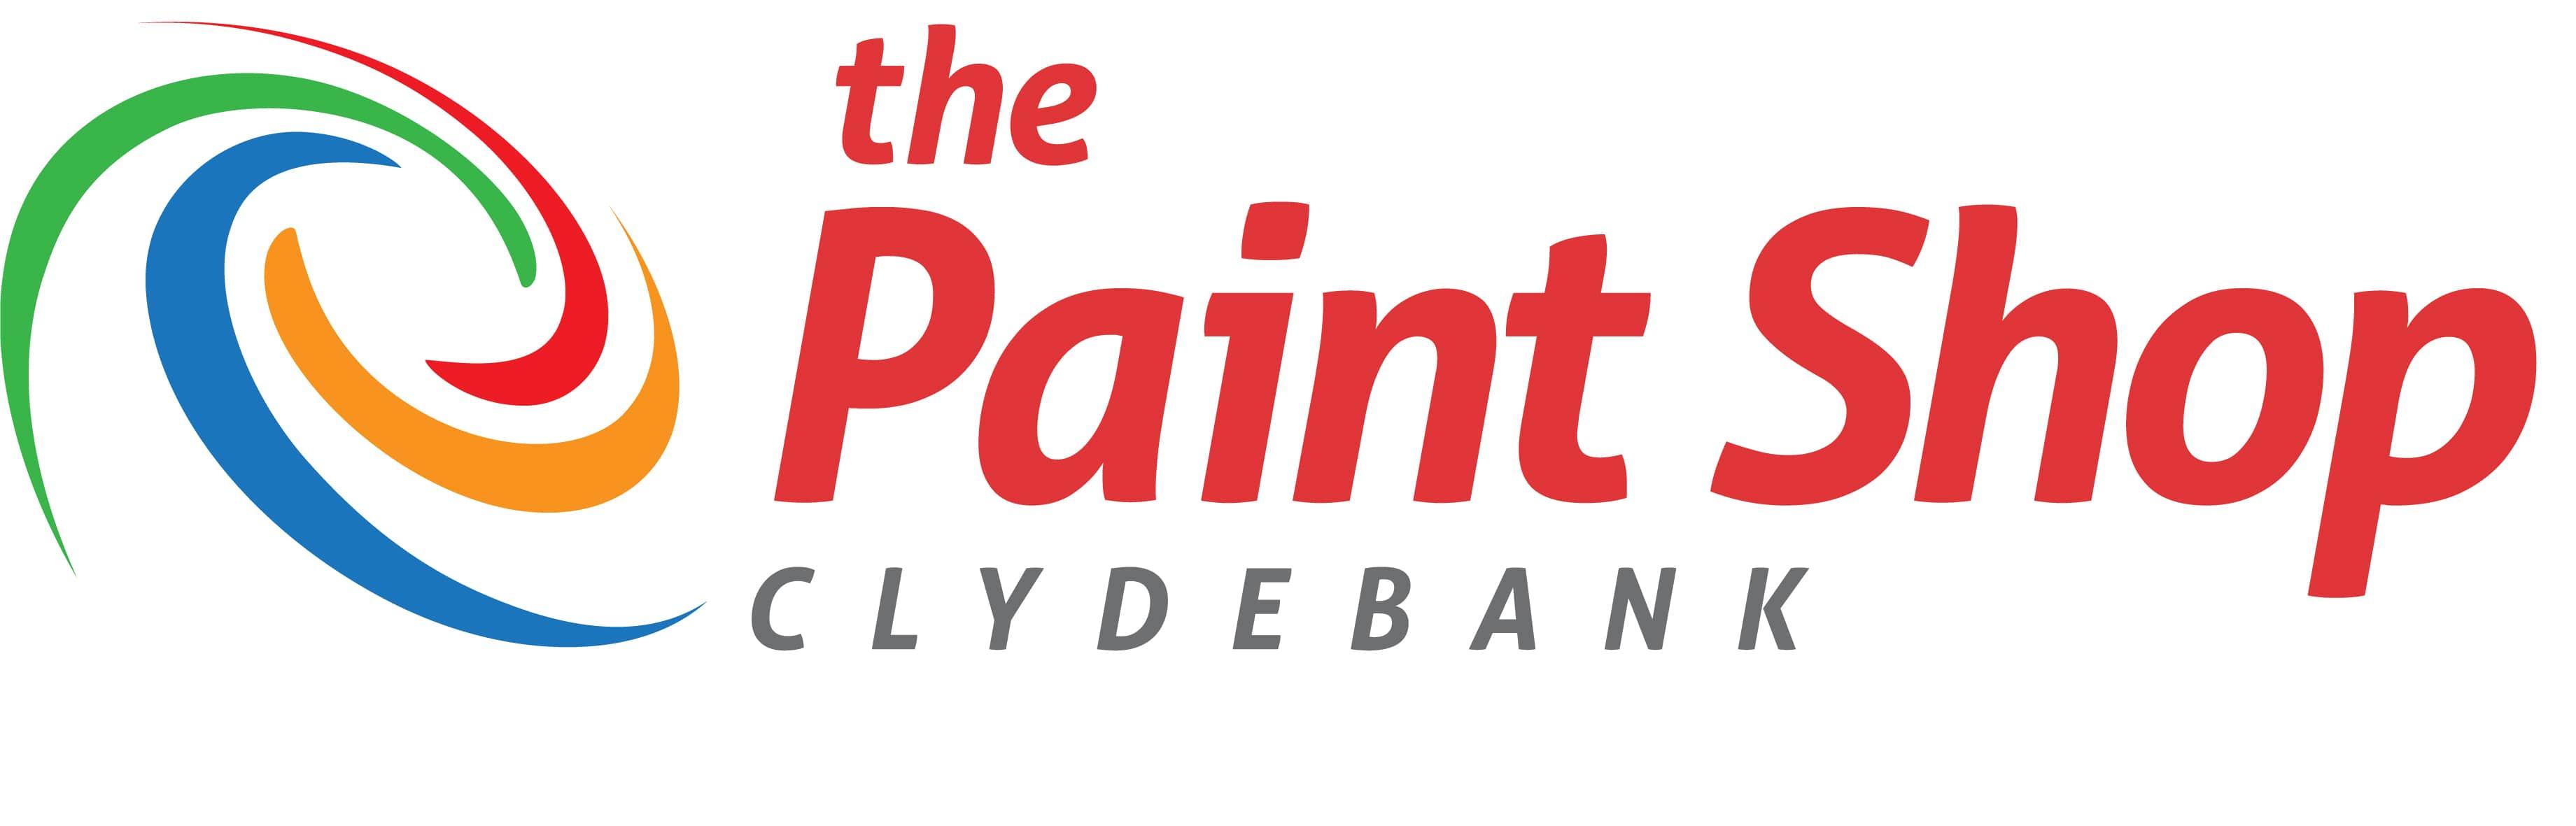 The Paint Shop Clydebank